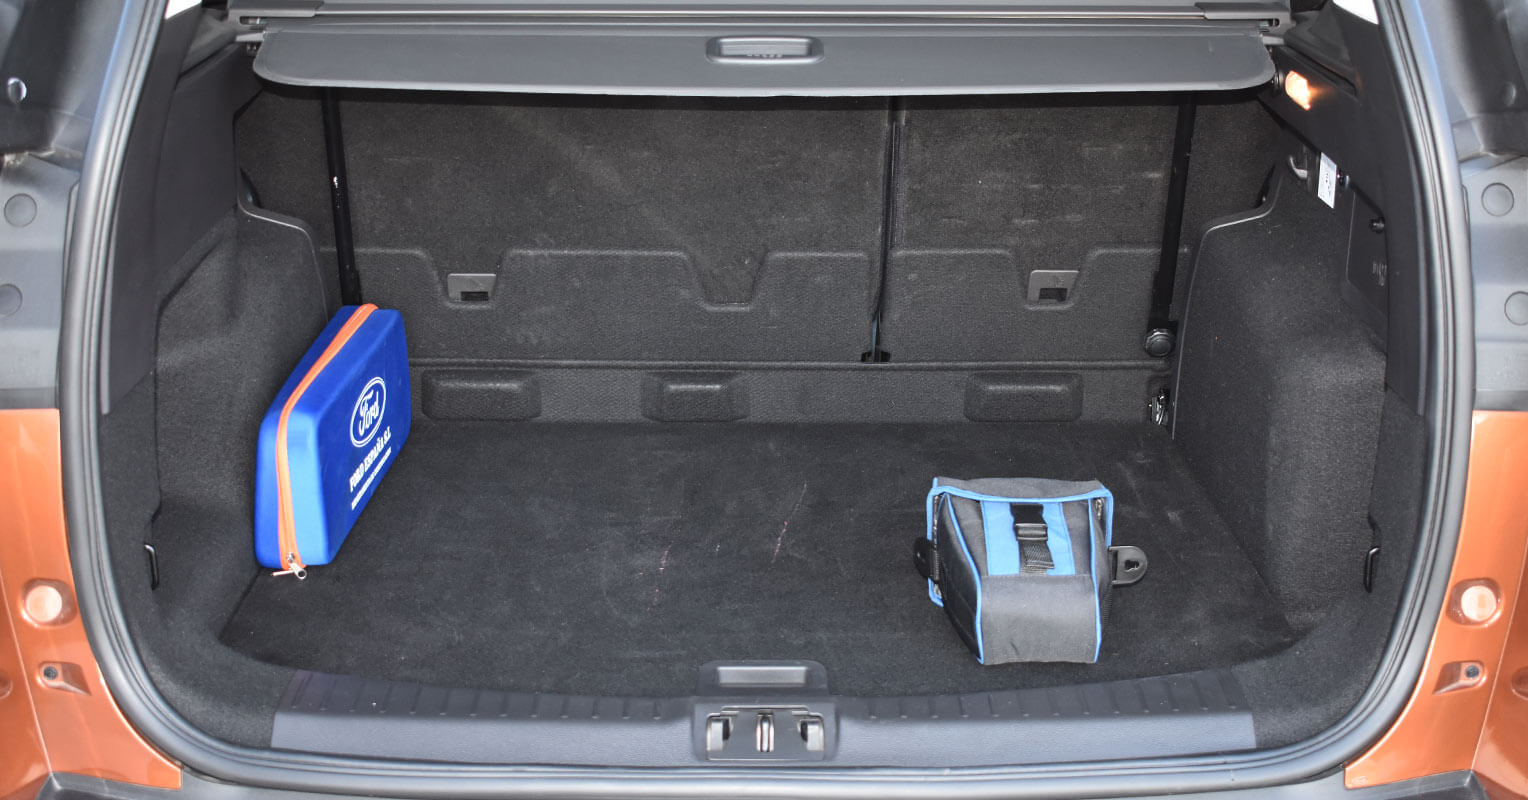 Maletero del Ford Kuga 2018